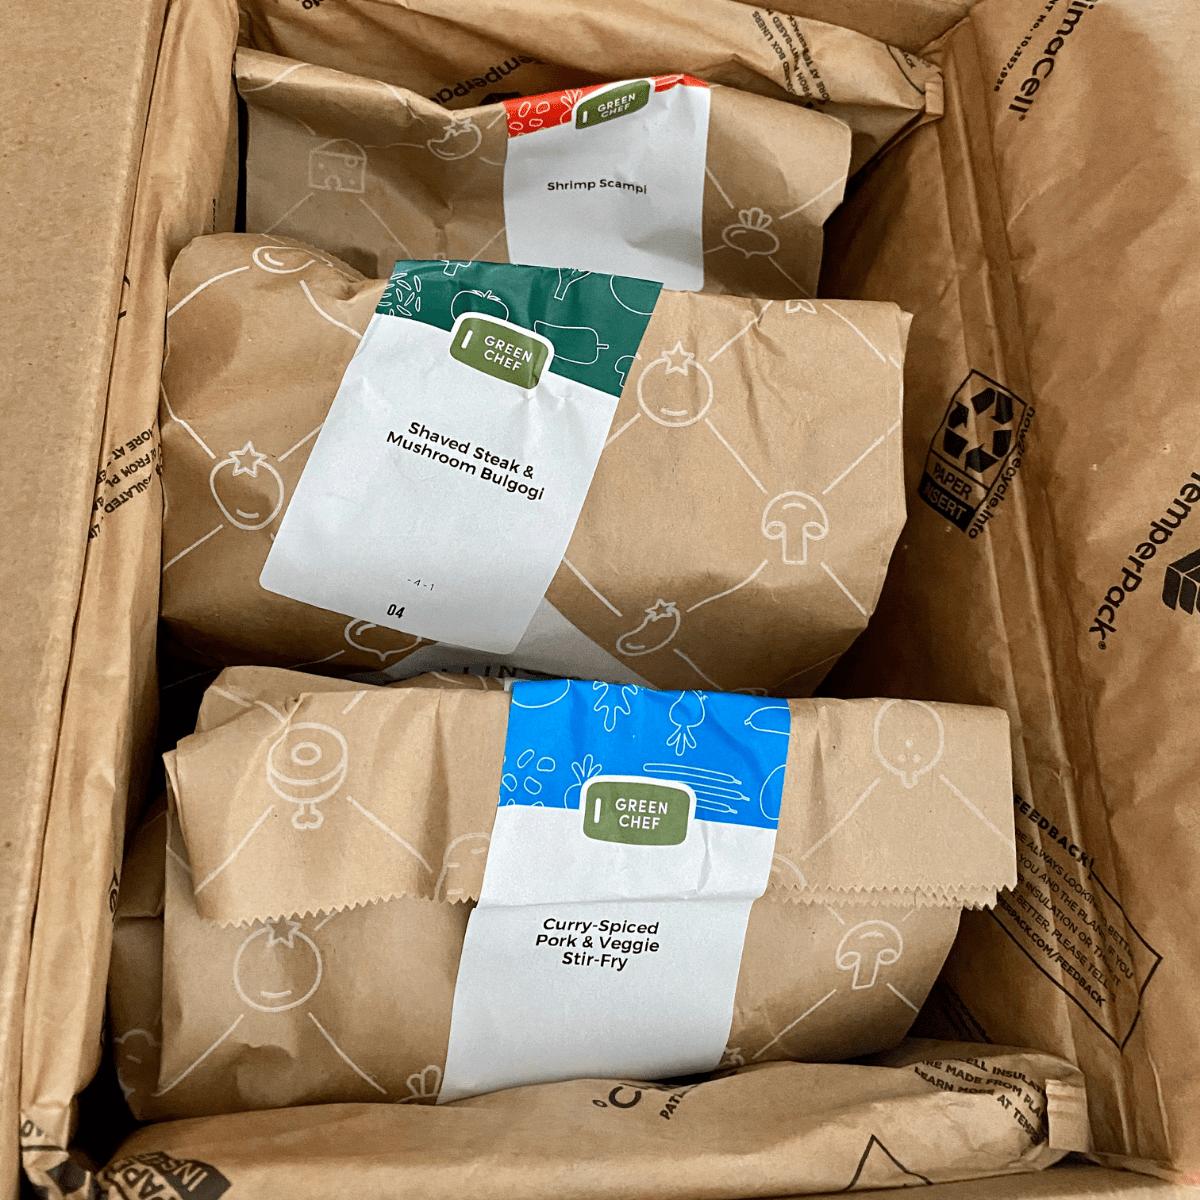 green chef recipe bags in the box